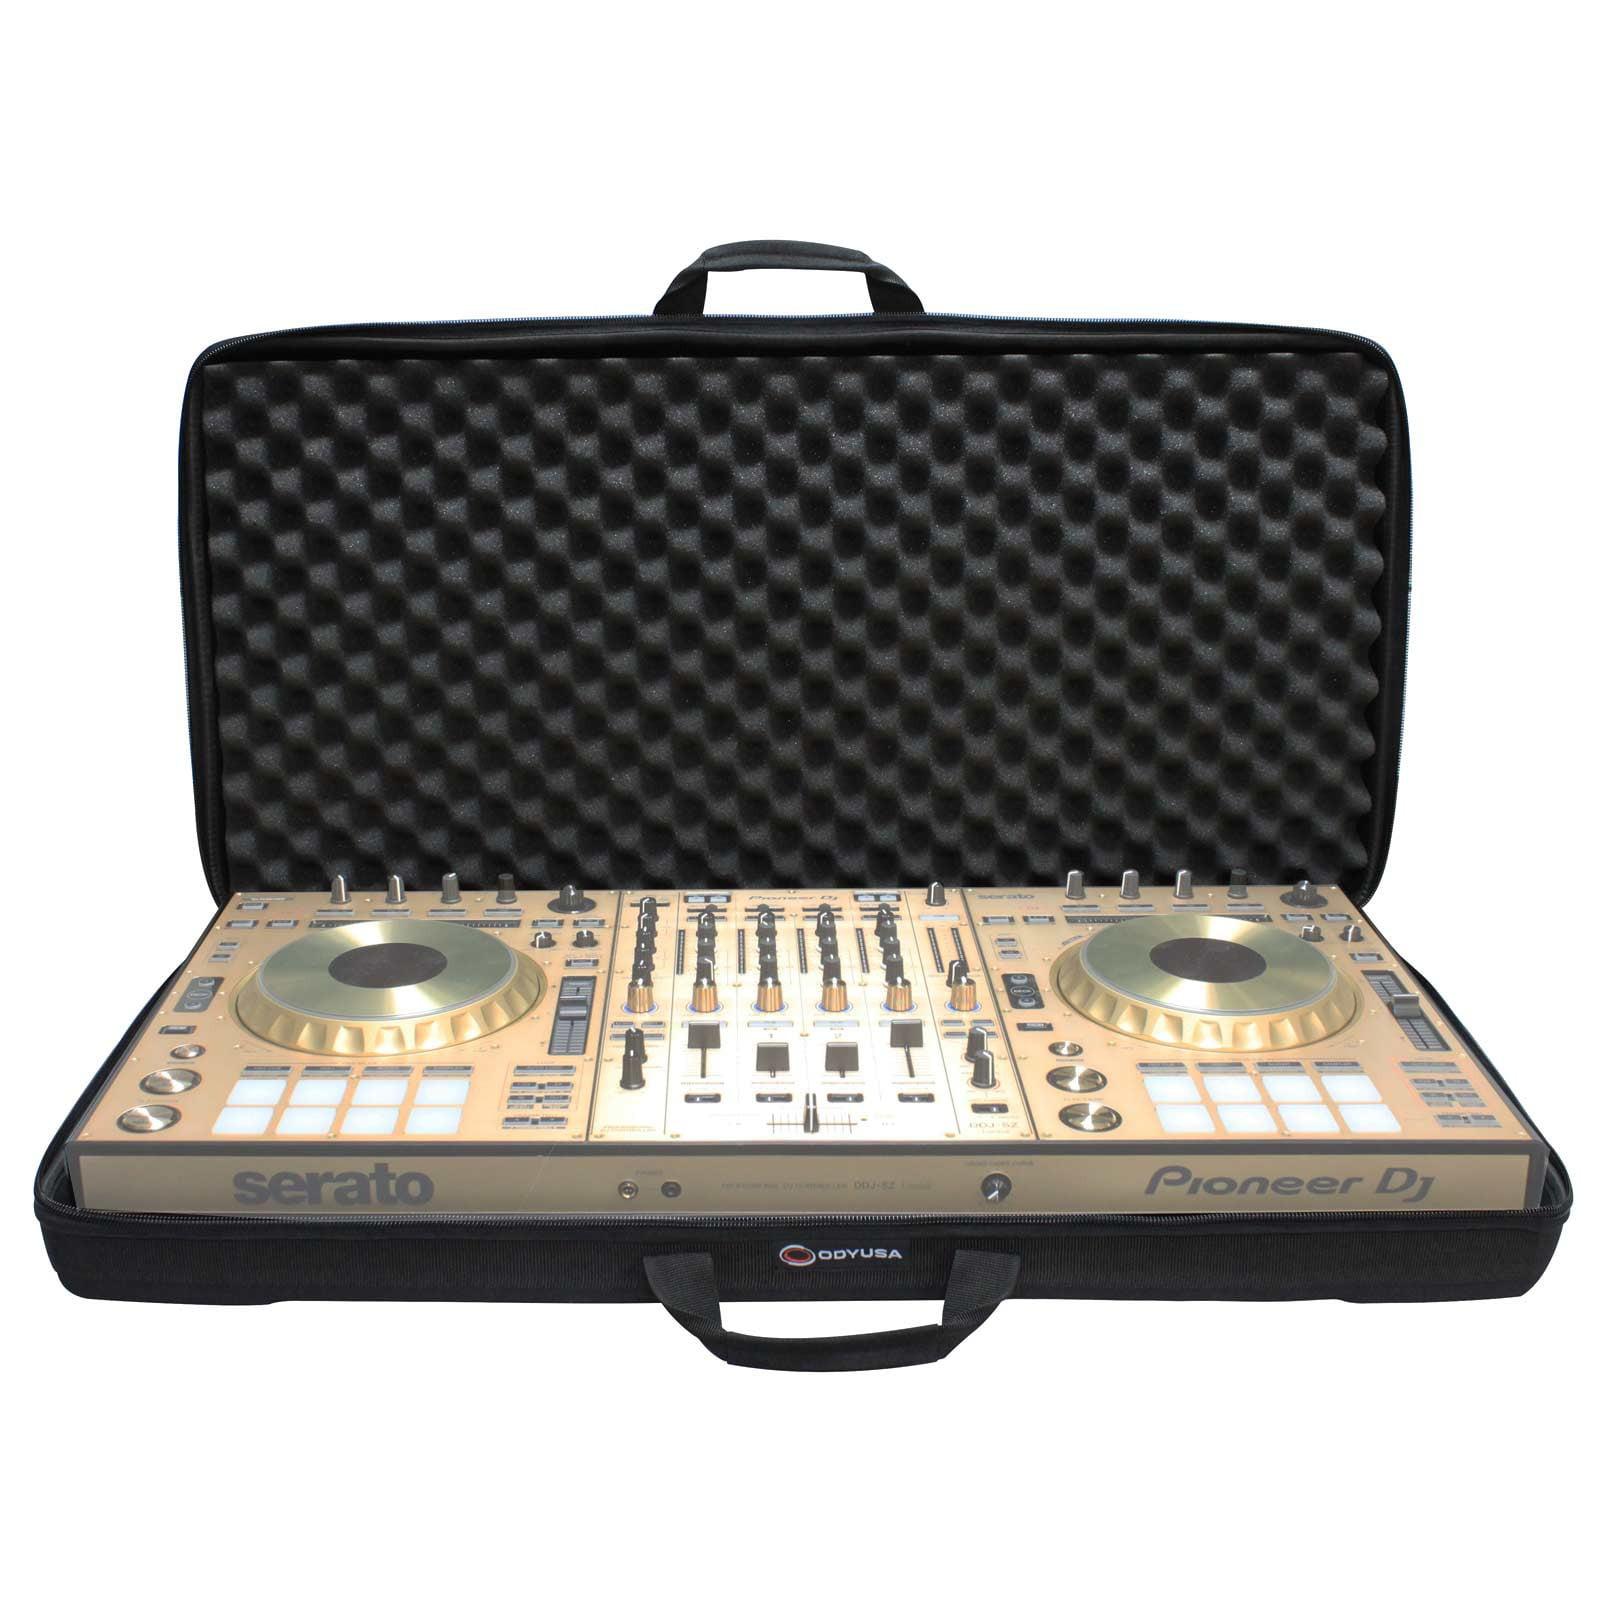 Odyssey BMSLDJCXL STREEMLINE Universal DJ Controller   Utility EVA Molded Carrying Bag... by